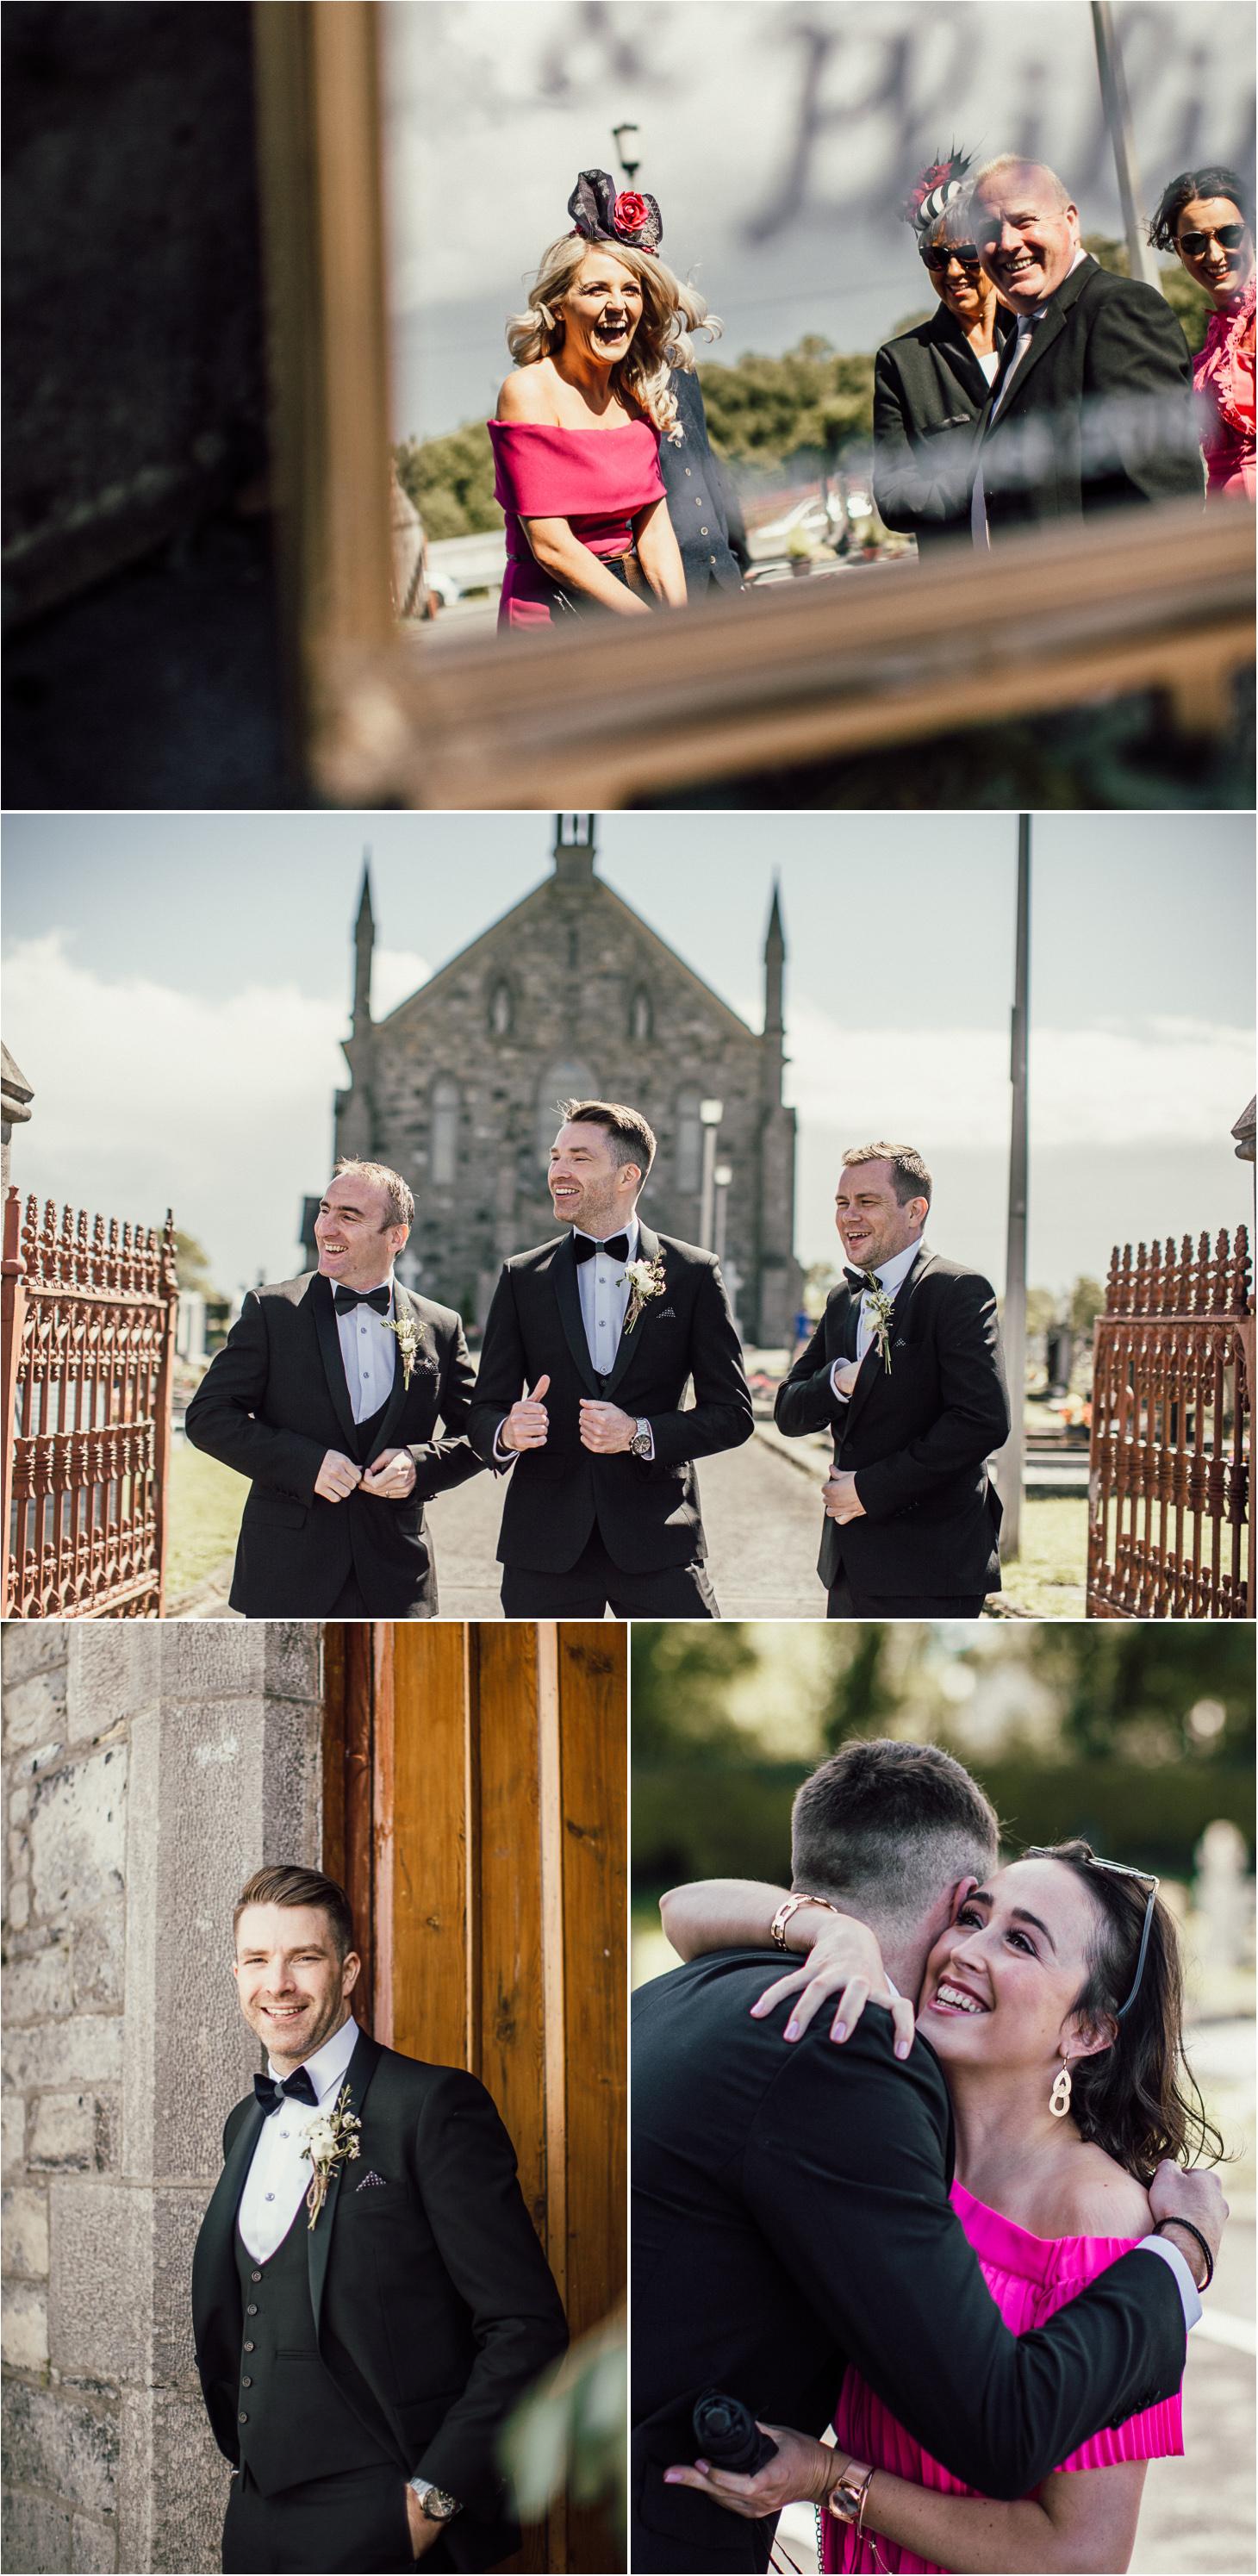 Virgina Lodge Photography. darren fitzpatrick. Wedding.6